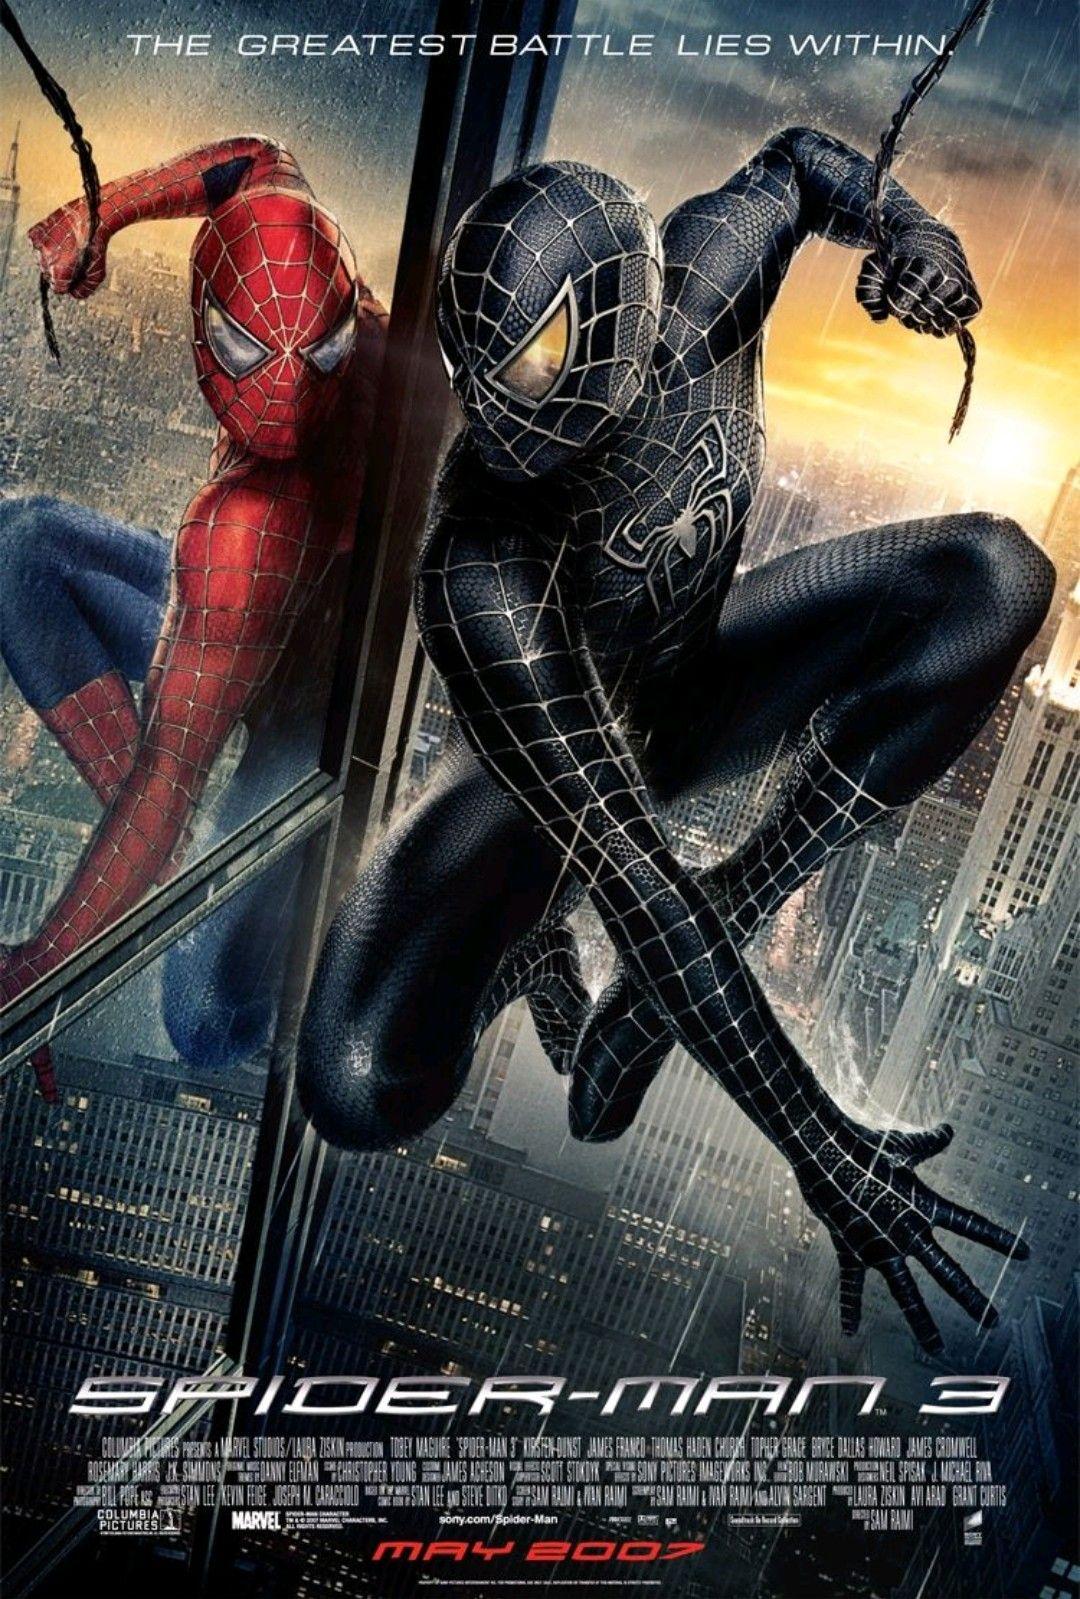 Pin By Isabel Padovani On Spider Man Spiderman Movie Spiderman Marvel Movies